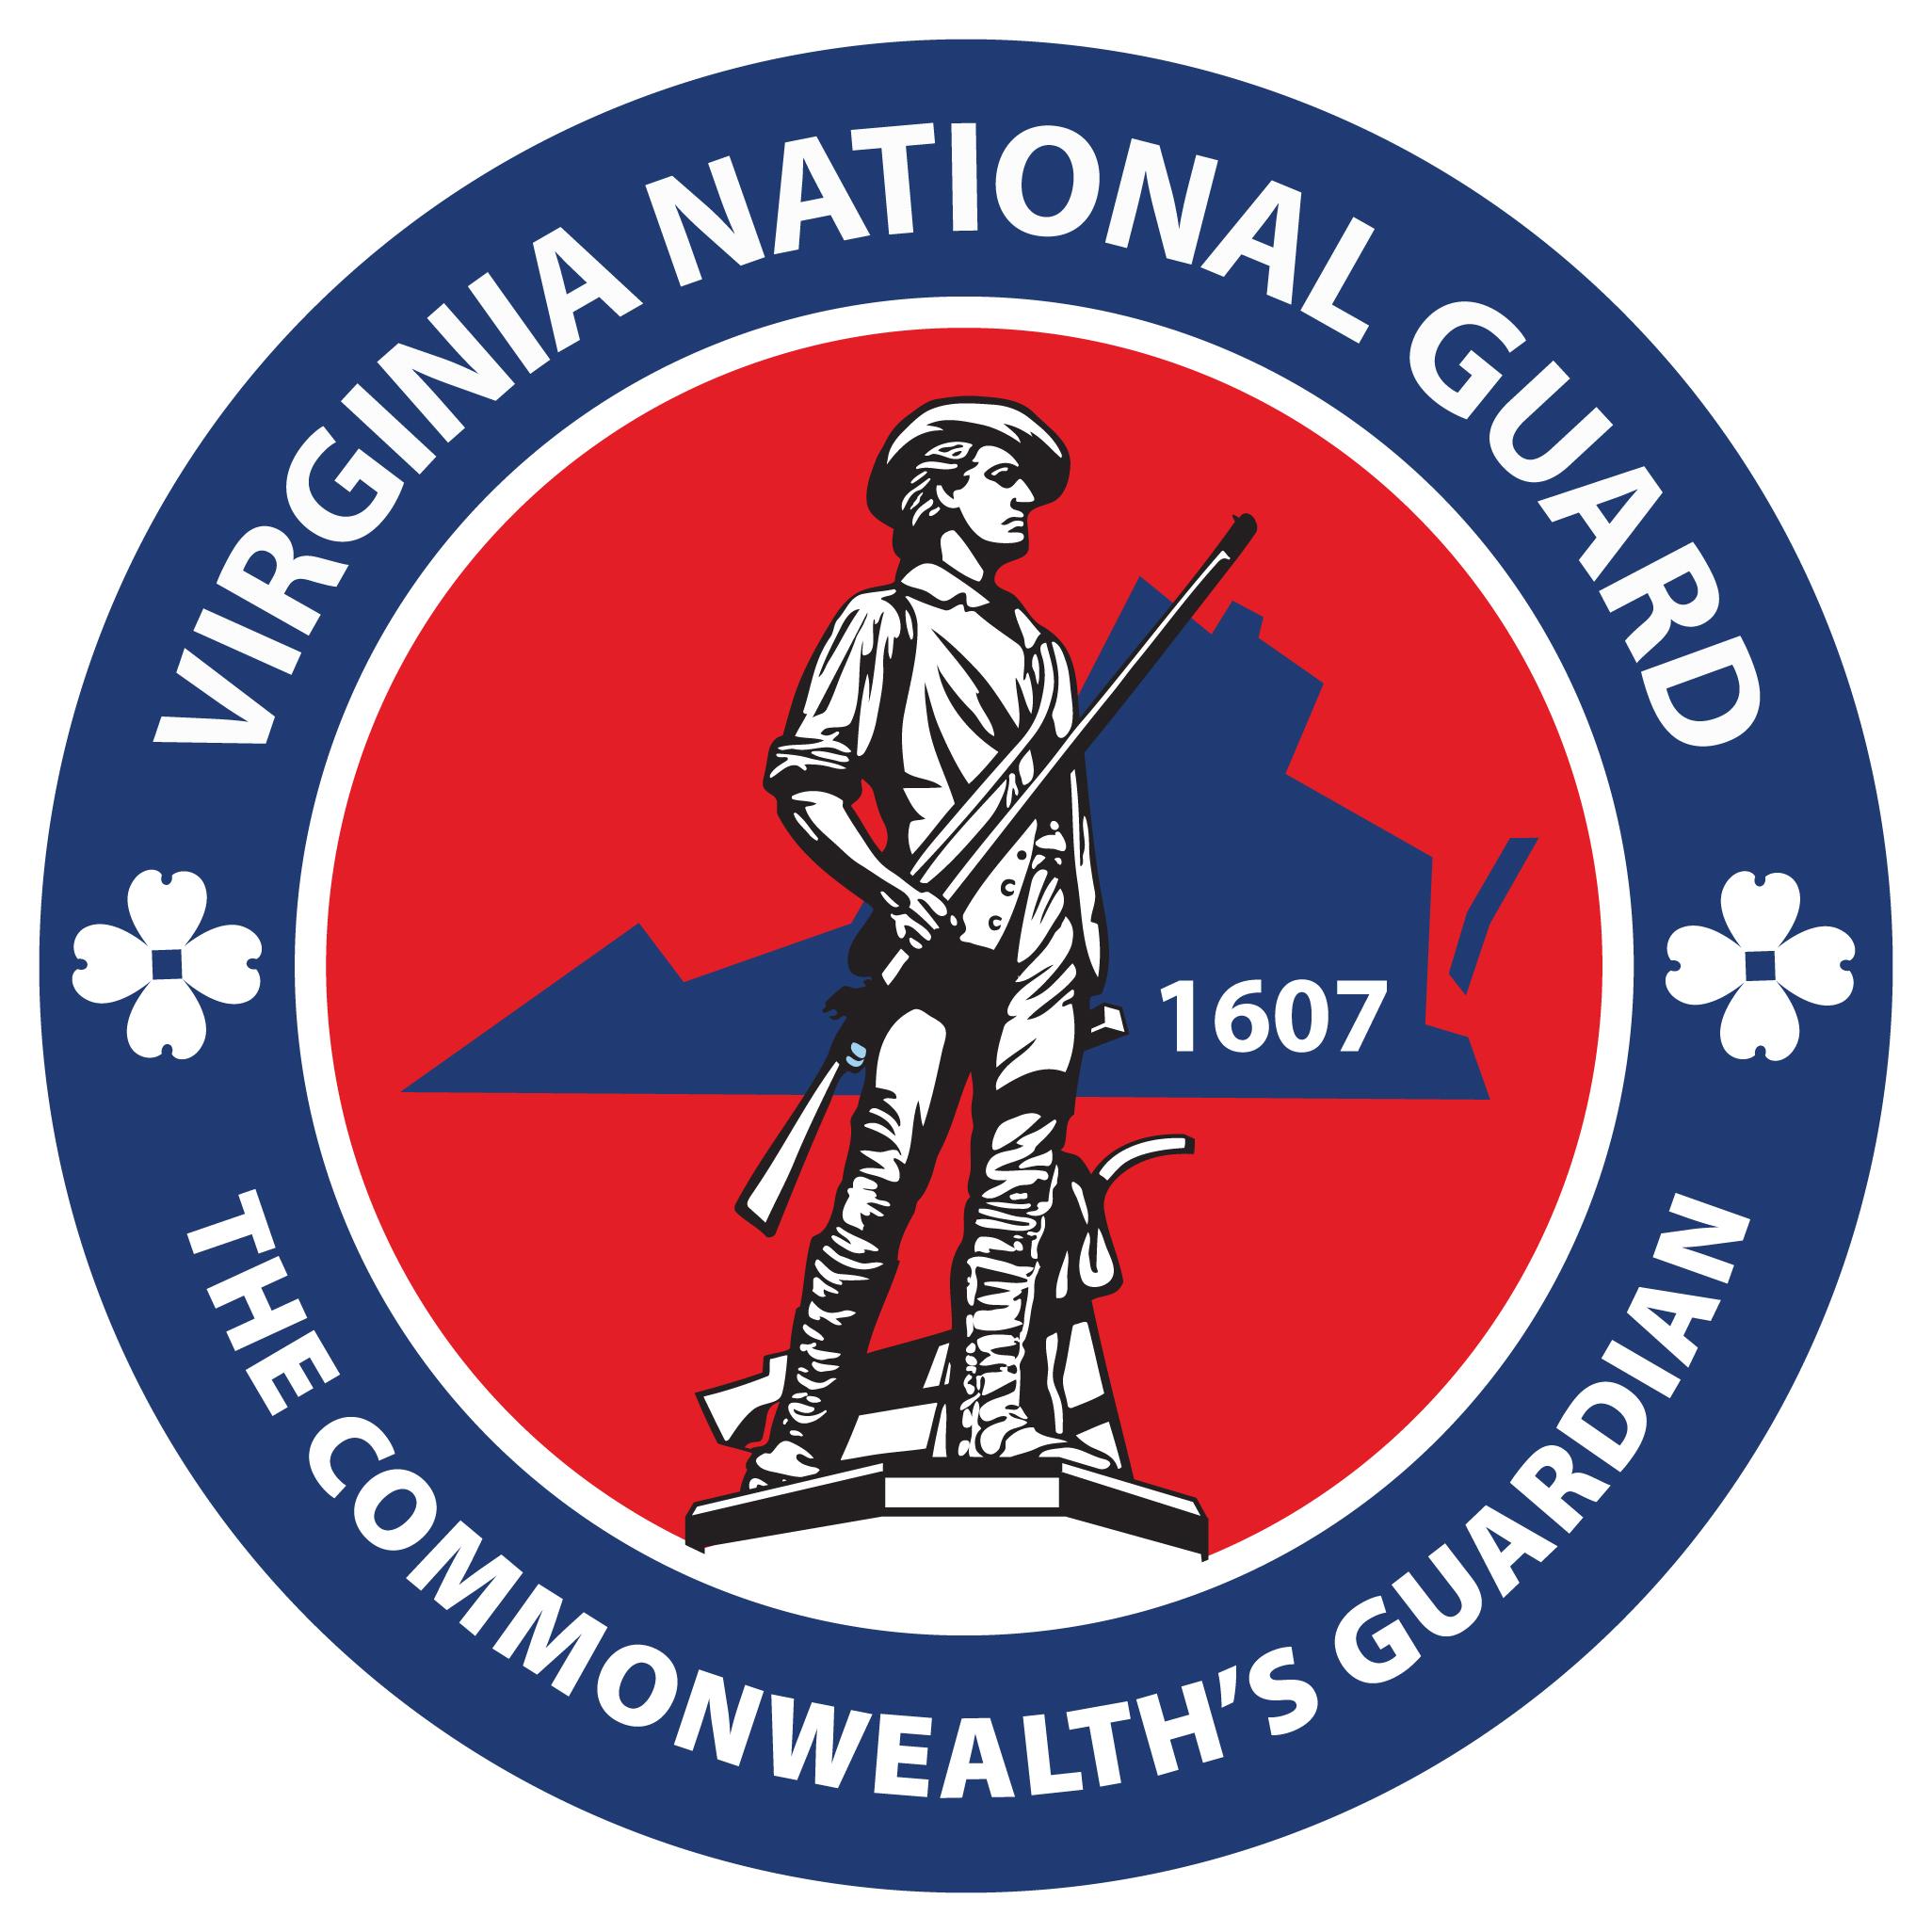 Governor McAuliffe: Arm VA's National Guard!